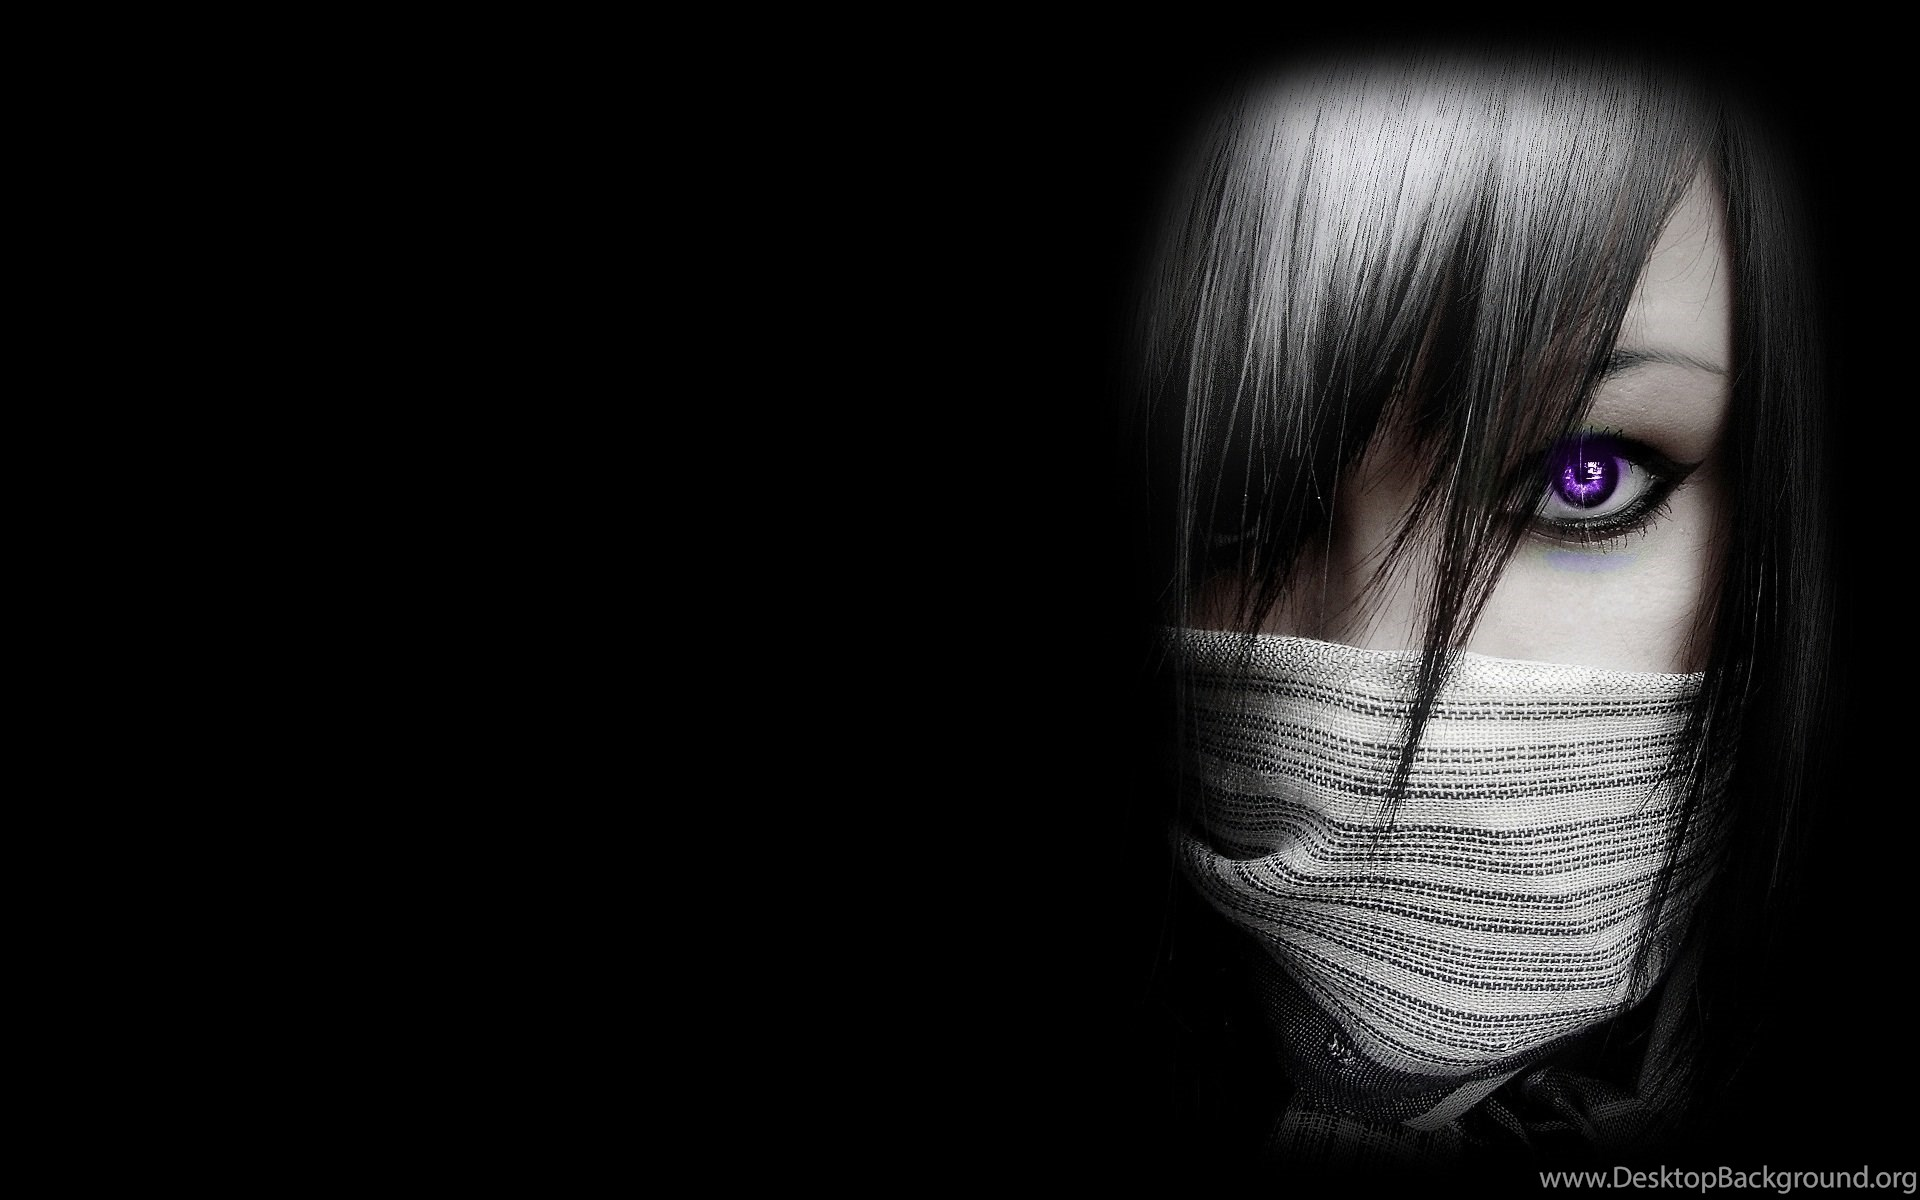 Dark Anime Scenery Wallpapers Phone Uncalke Com Desktop Background